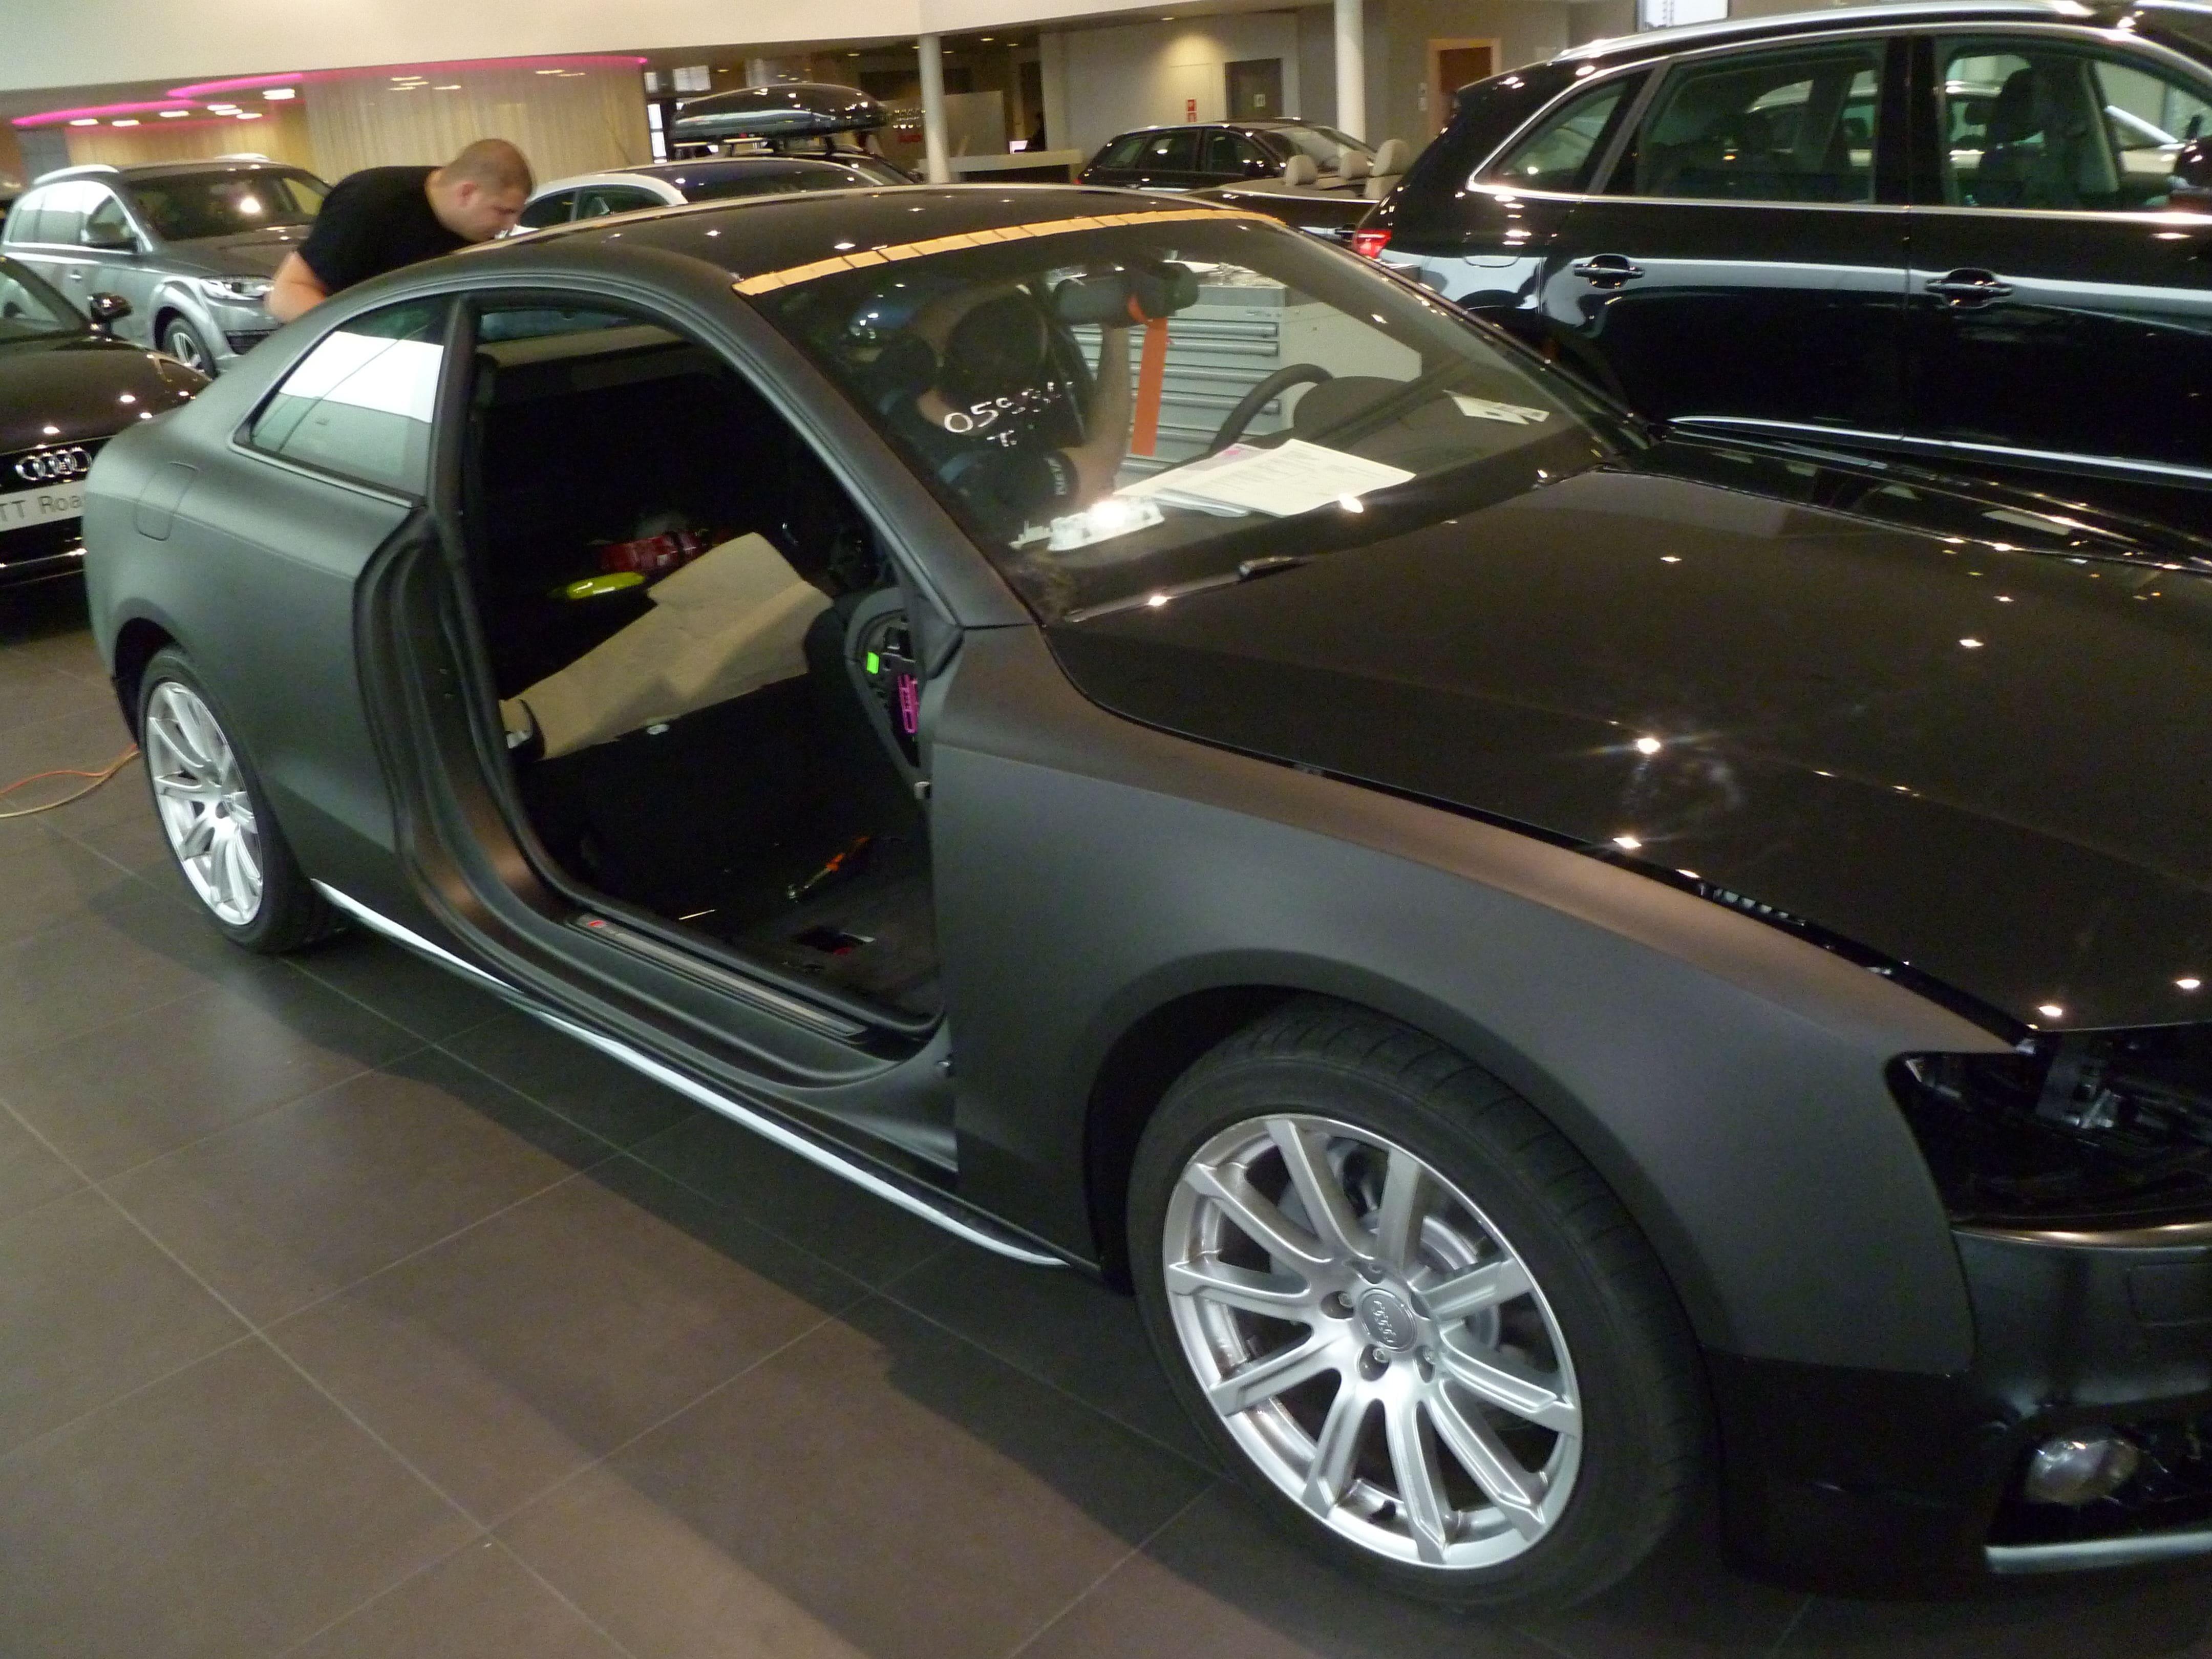 Audi A5 Coupe met Mat Zwarte Wrap, Carwrapping door Wrapmyride.nu Foto-nr:4625, ©2021